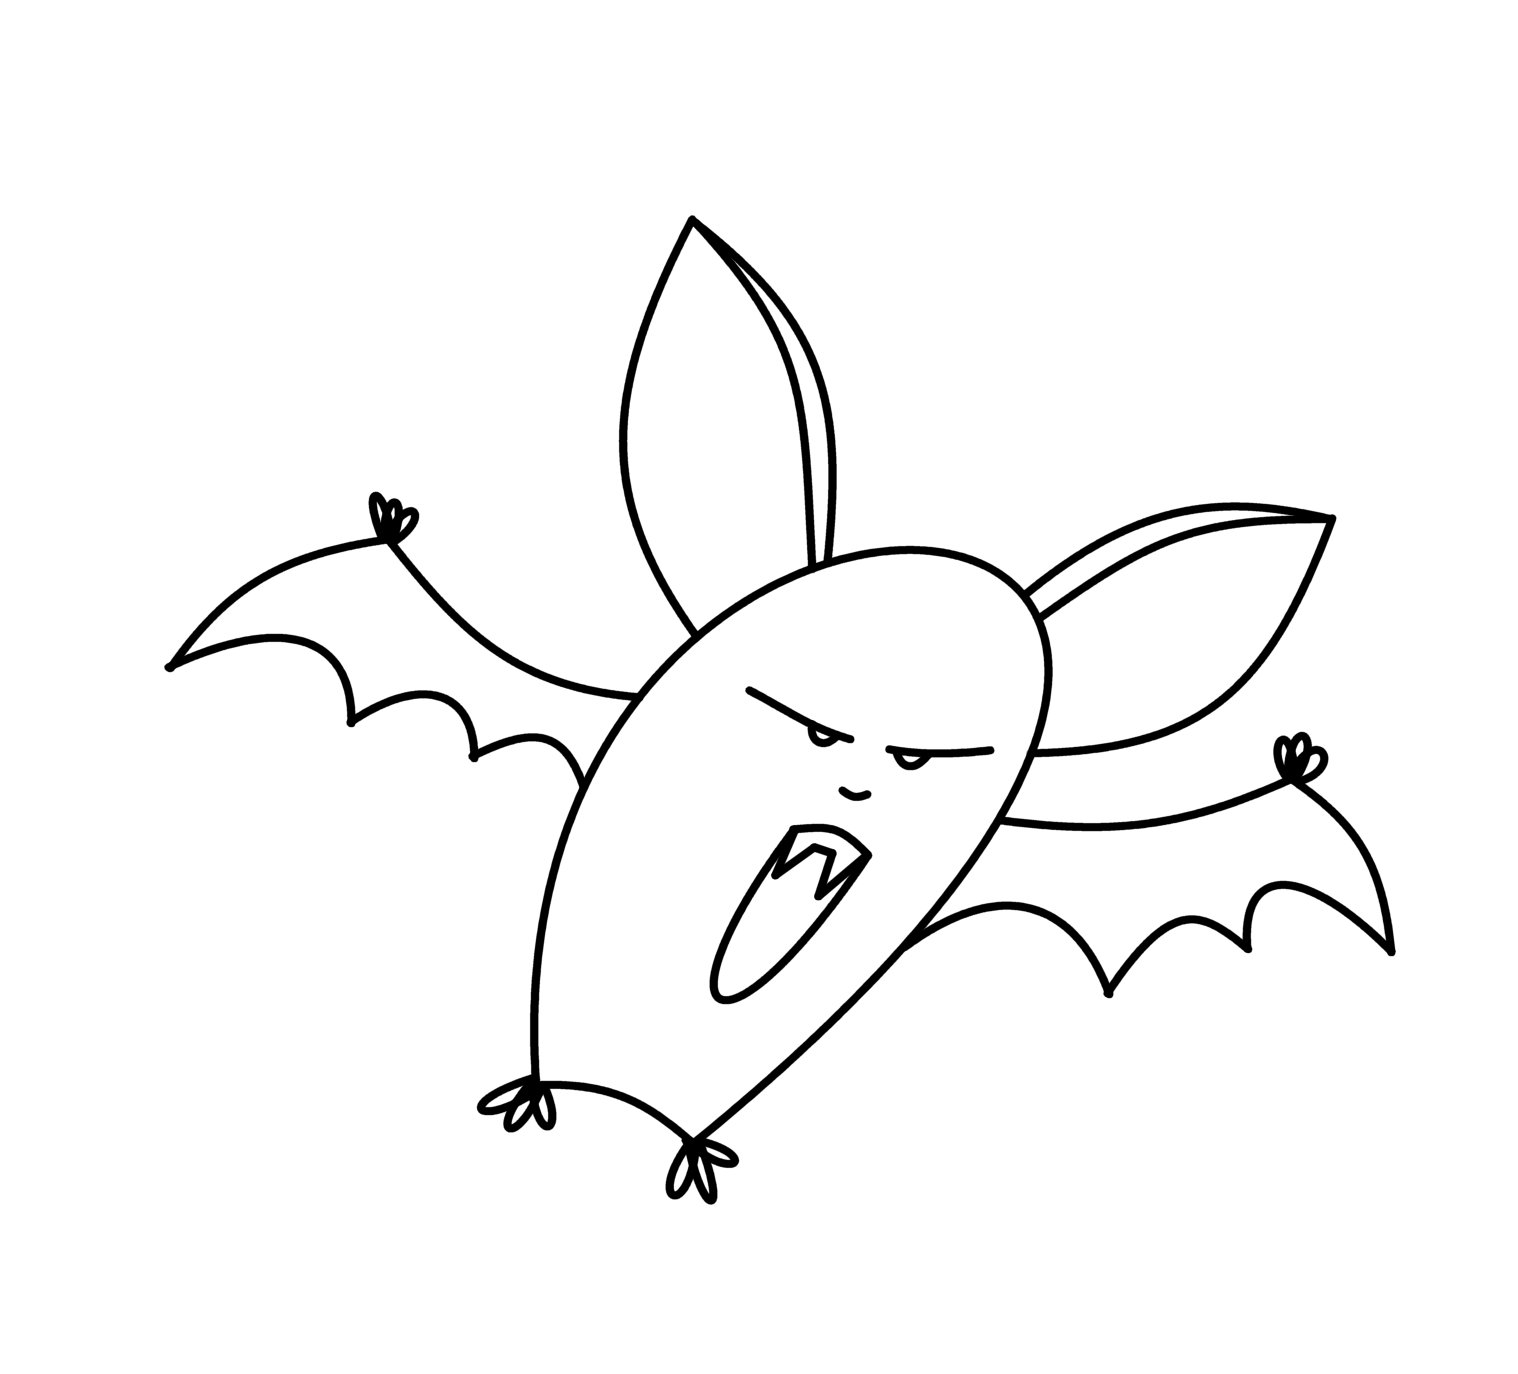 How To Draw Cartoons: Vampire Bat